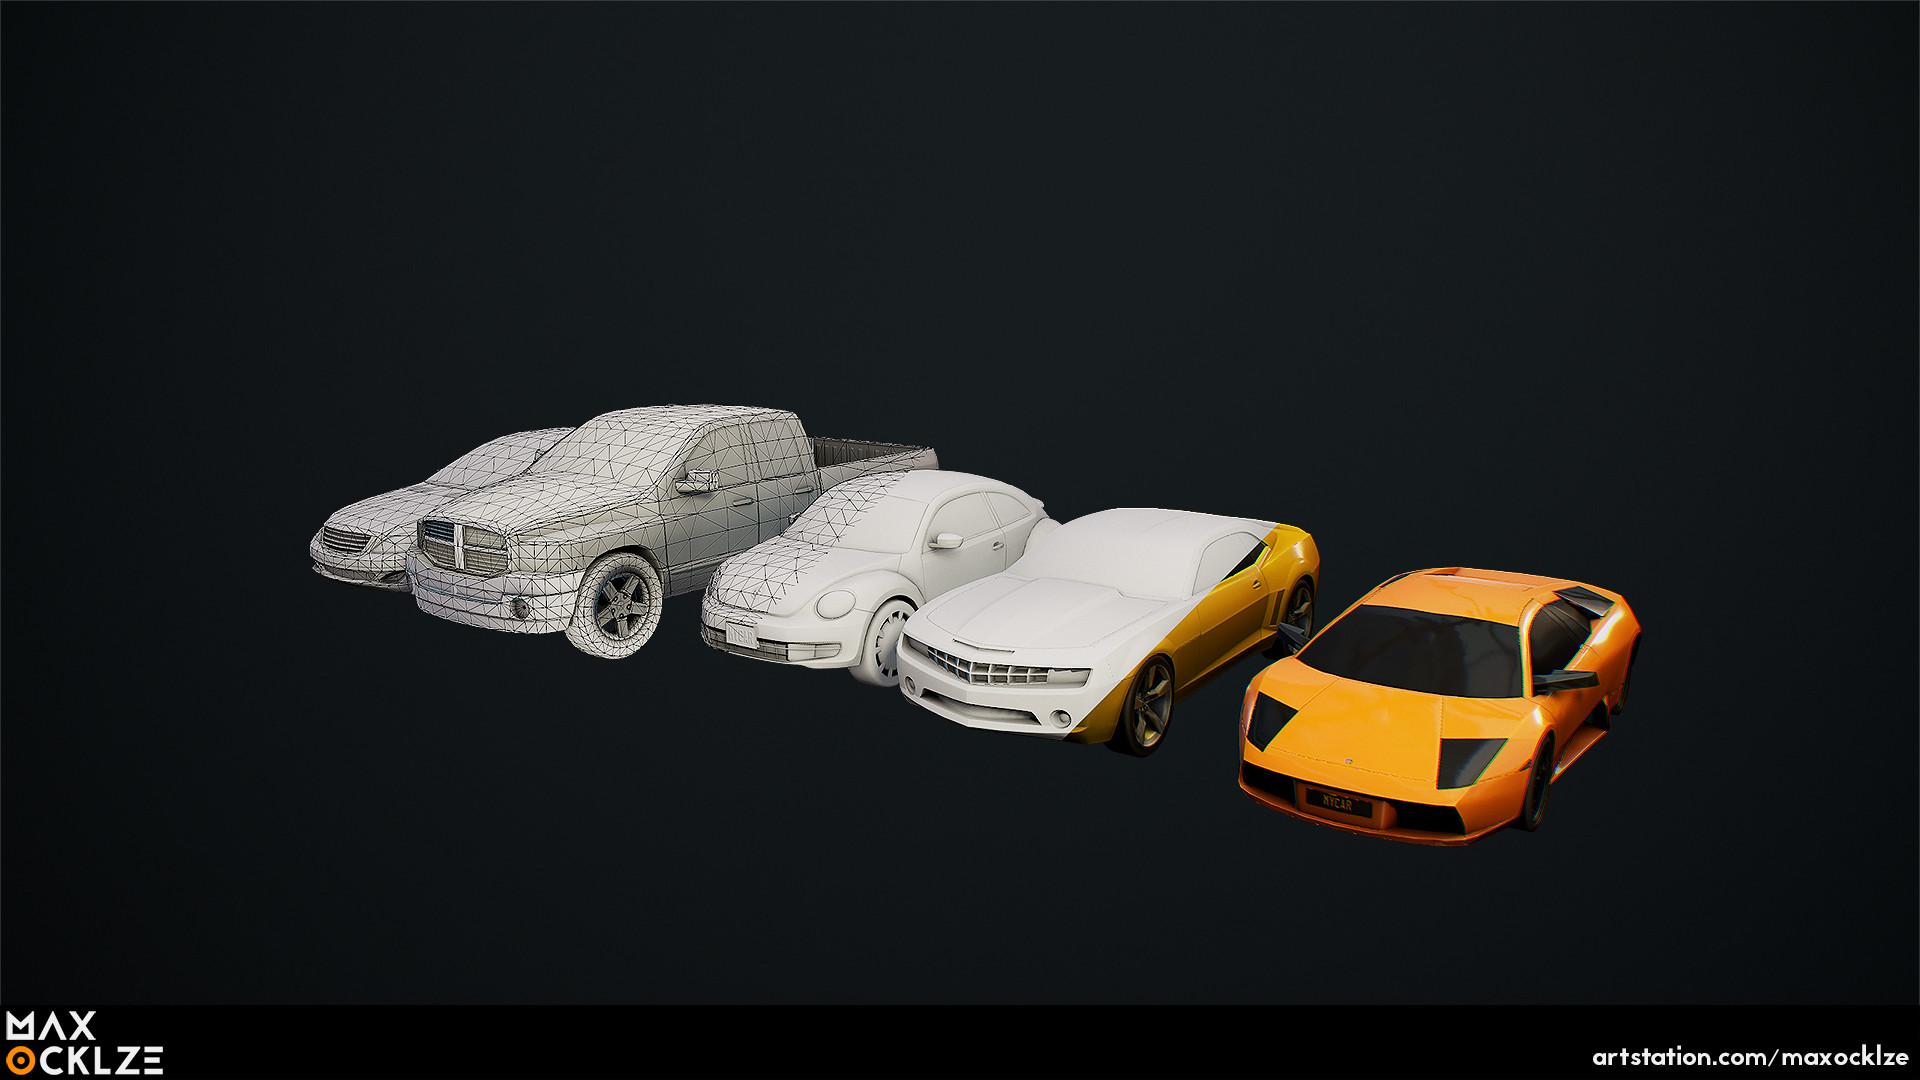 Max ocklze cars 3